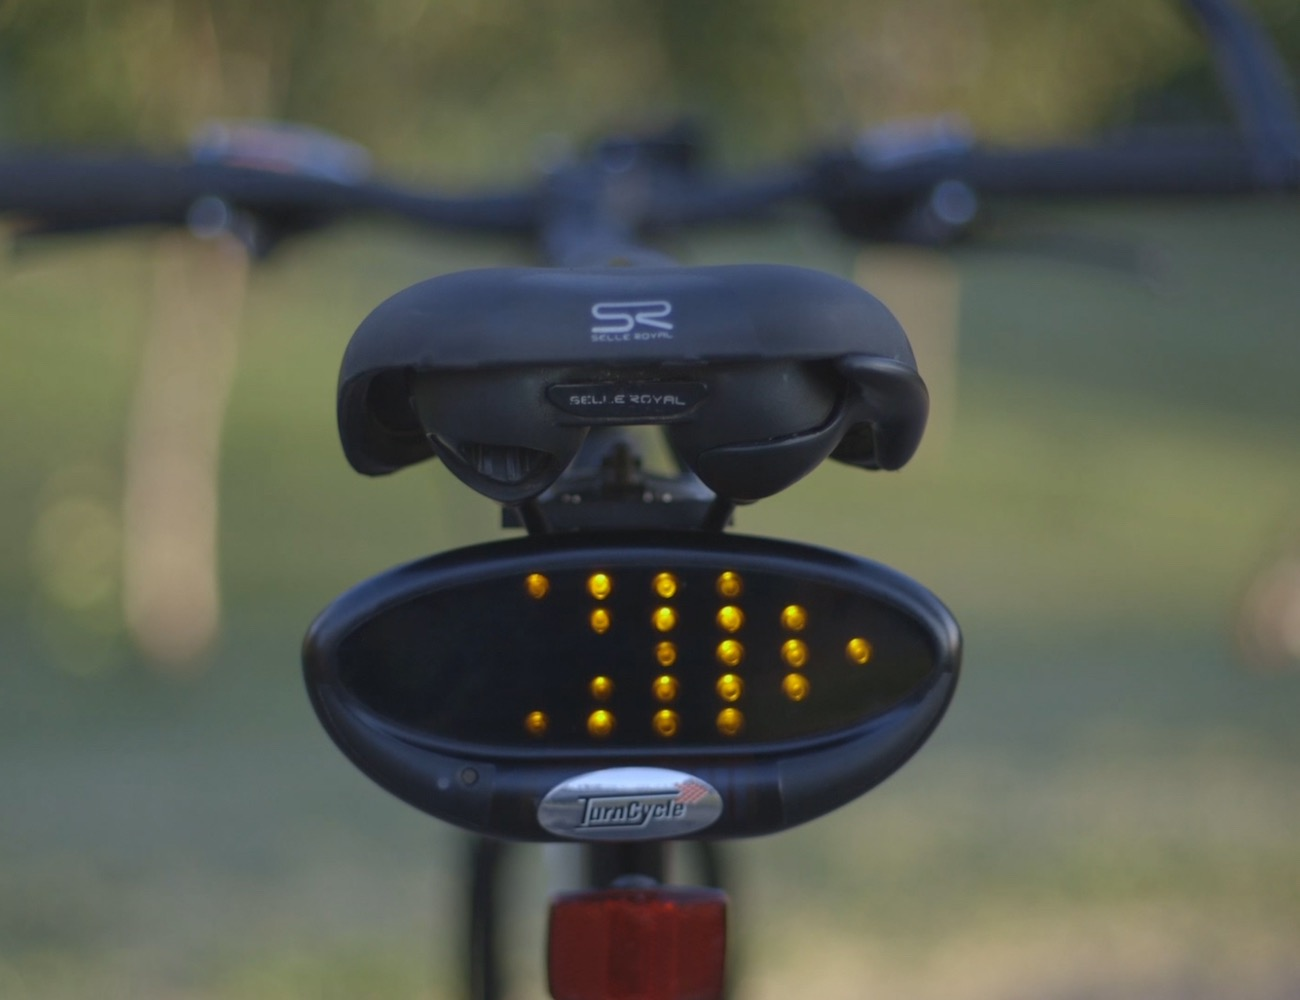 turncycle-the-safest-bike-signalling-light-03